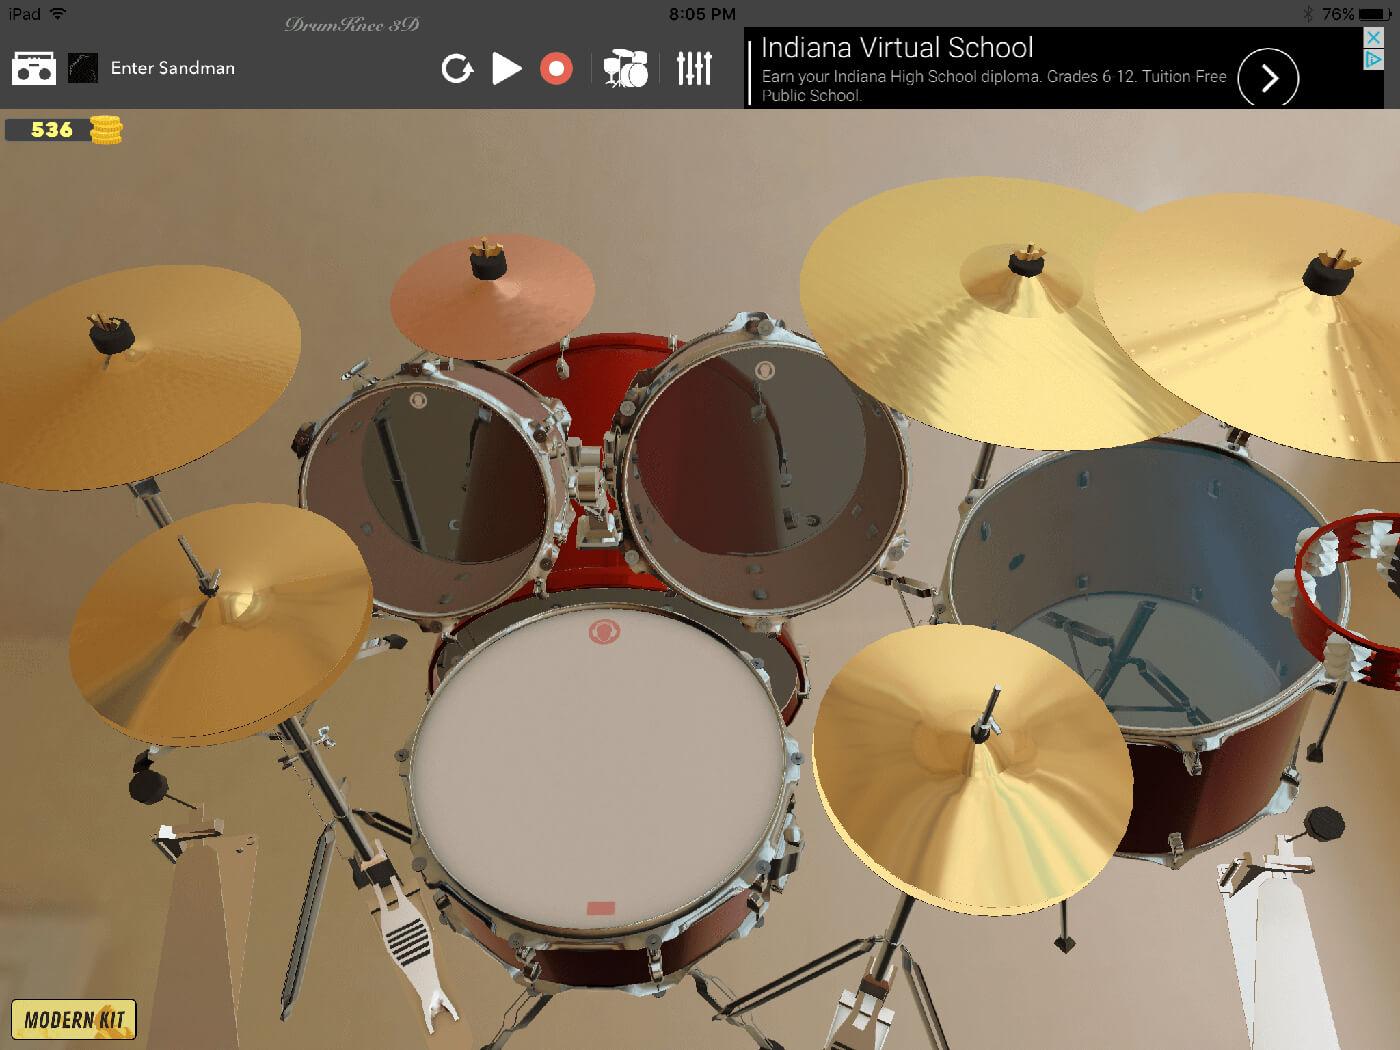 Paulo Ribeiro - DrumKnee 3D Drums (iOS & Android)